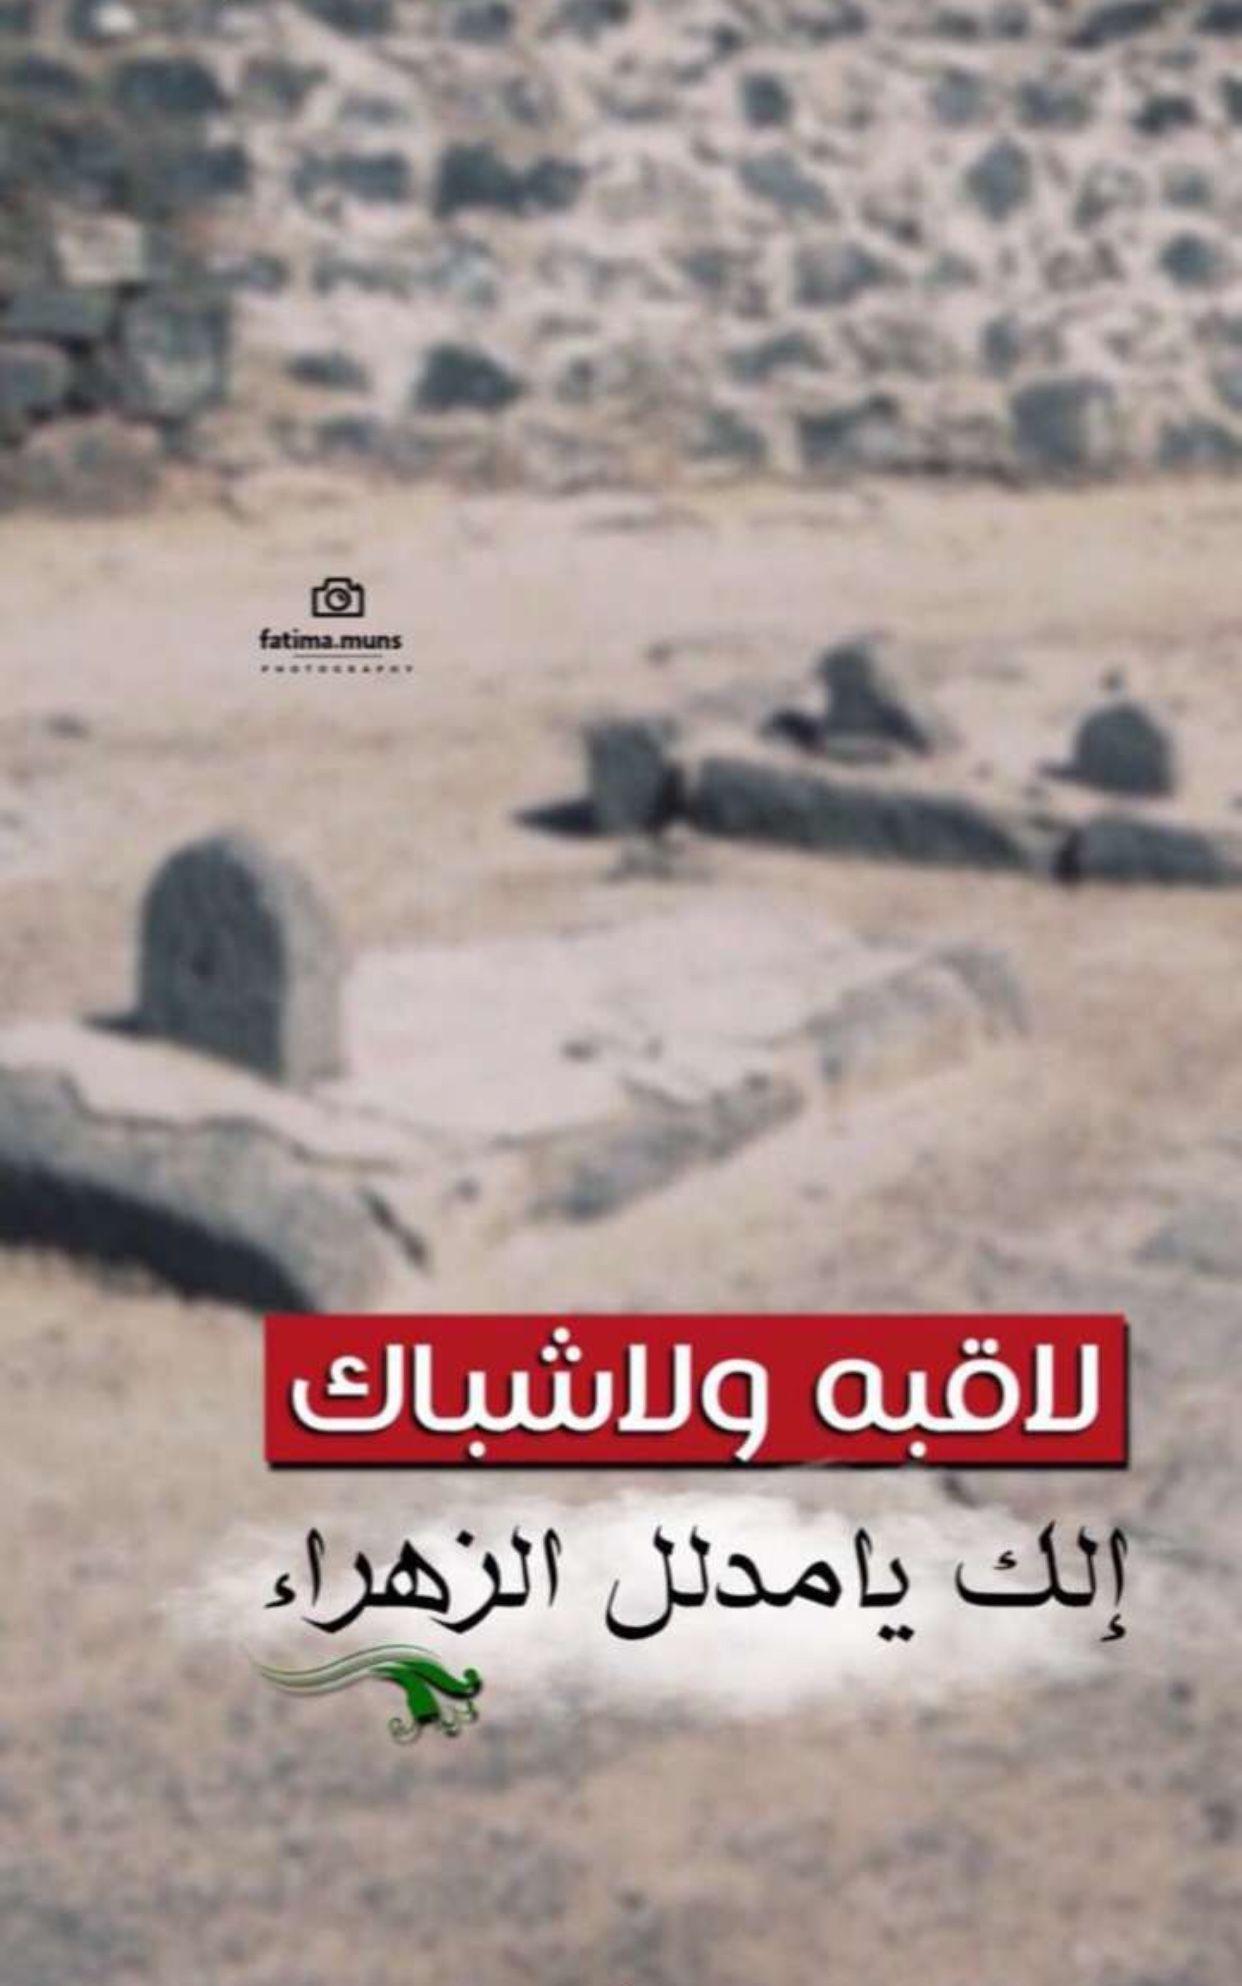 Pin By Narjis On مناسبات أهل البيت عليهم السلام Imam Hussain Islam Imam Ali